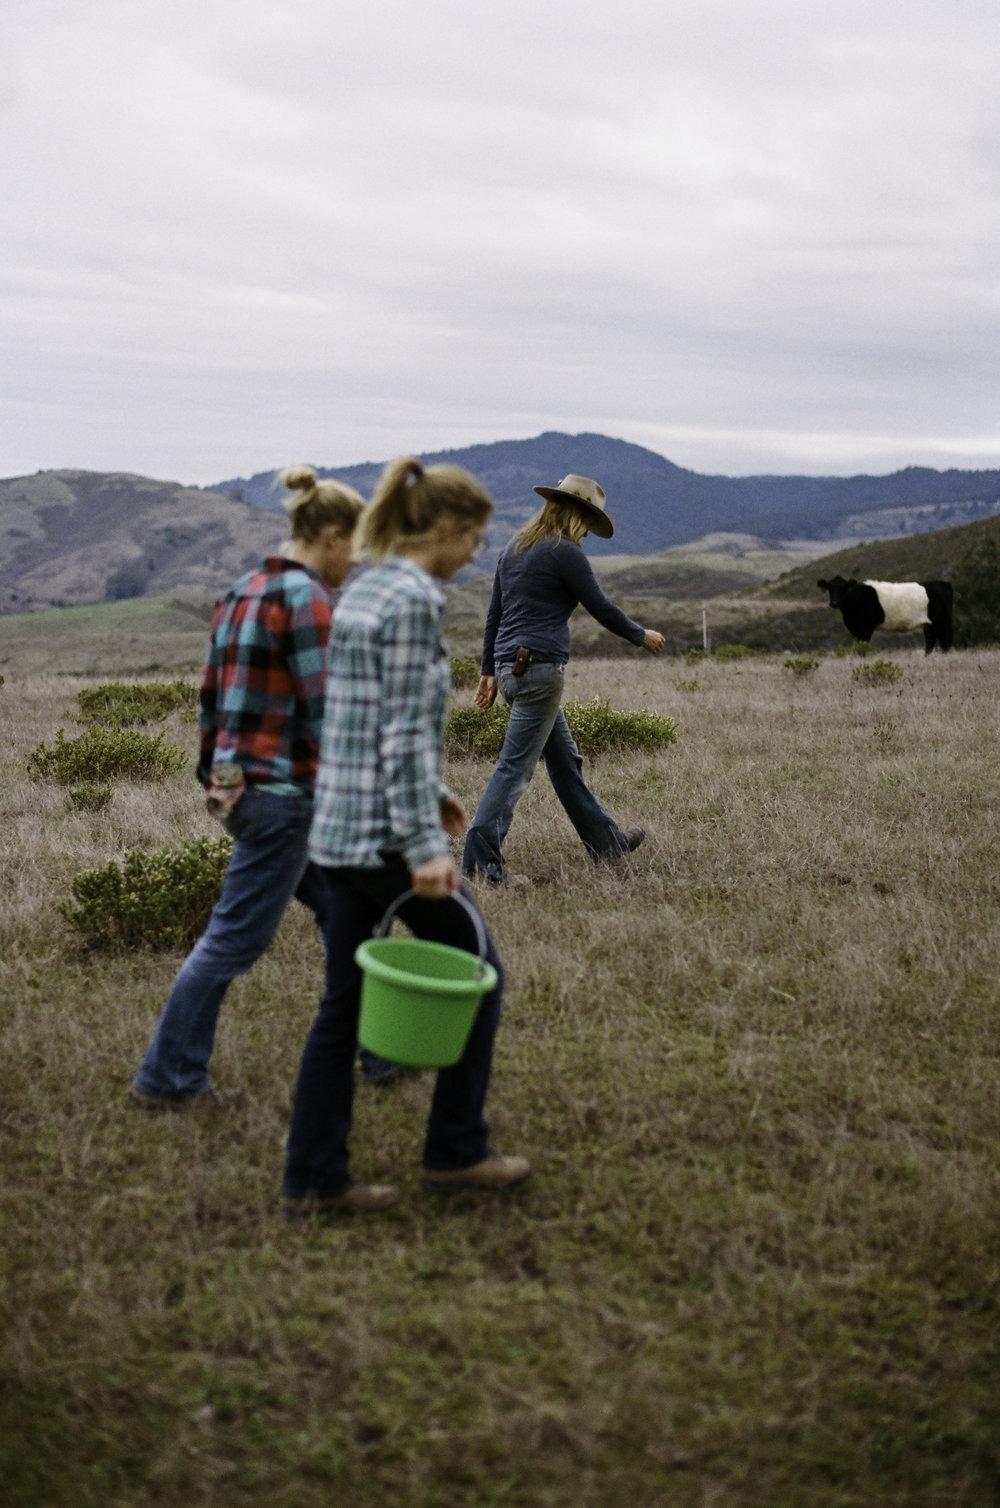 Ruth, Johanna, and Doniga walking back from the pig area. - Half Moon Bay, CA